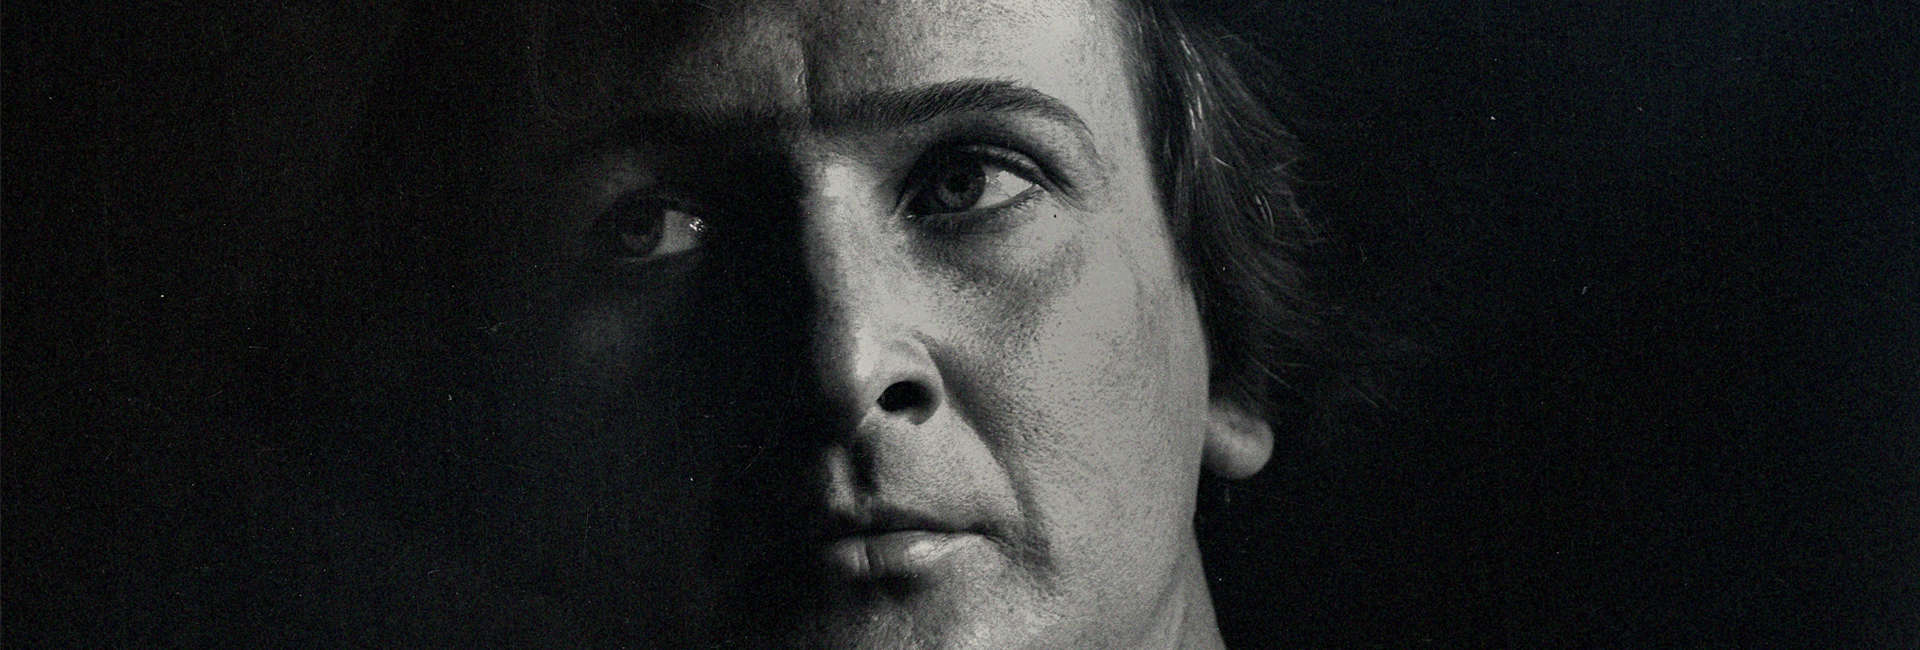 Stanisław Szukalski, portrait, courtesy Netflix Official Site detail